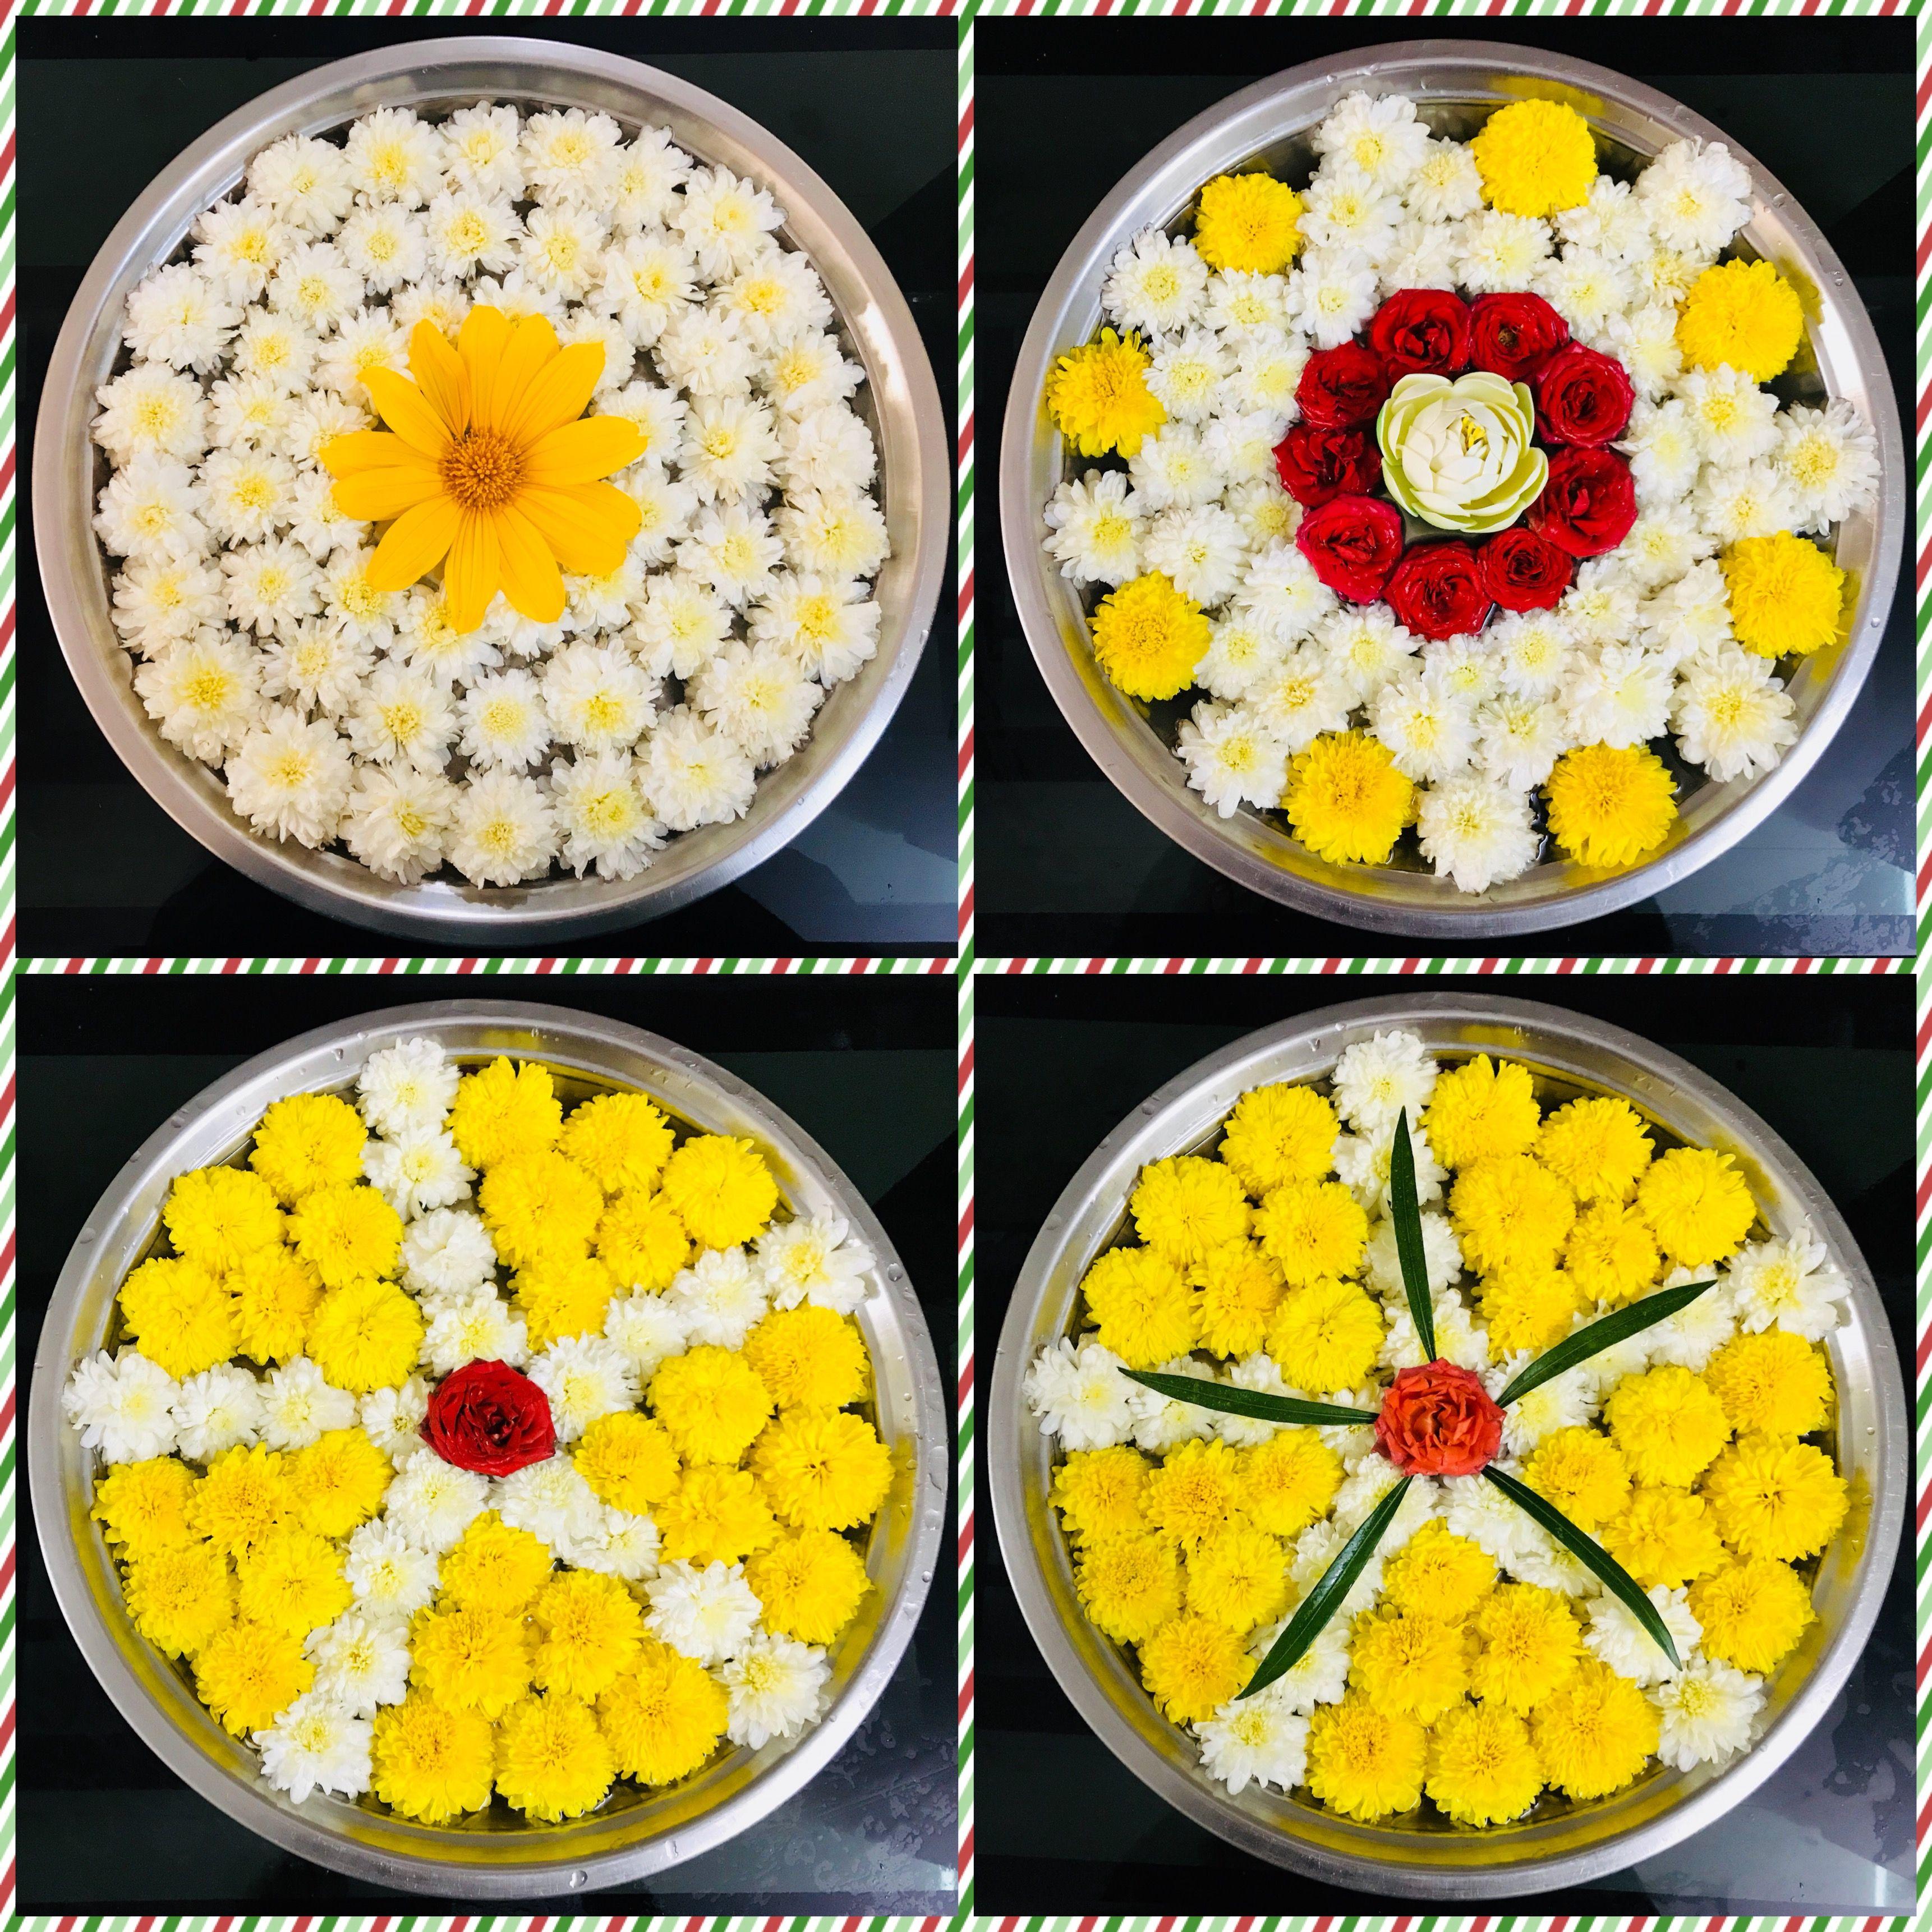 Floating flowers (With images) Ganpati decoration design